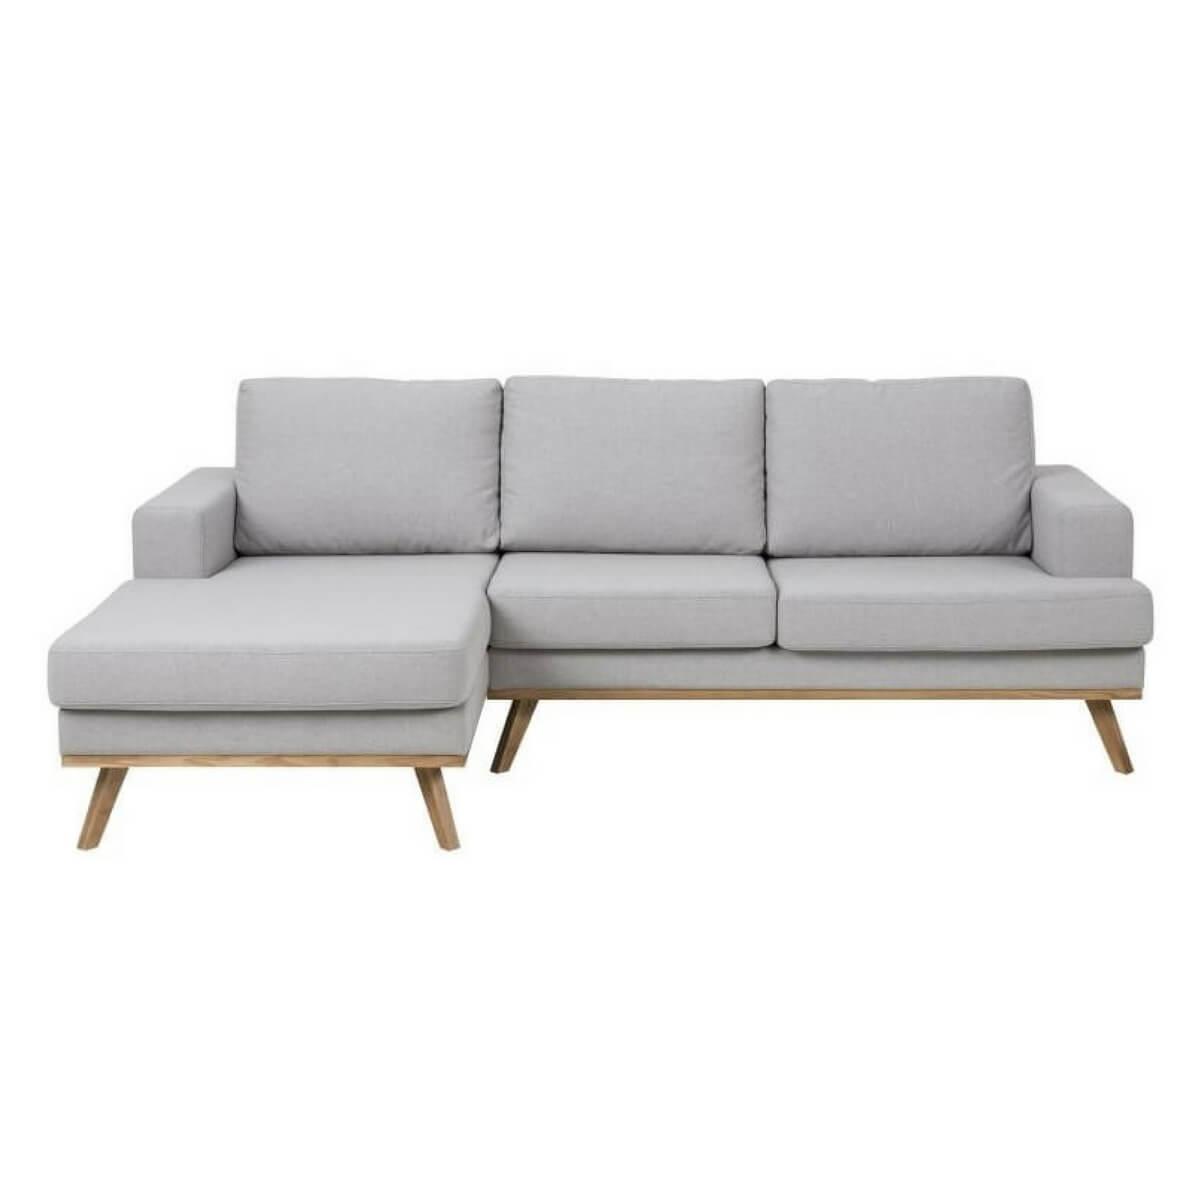 billige sofa til salg recliners trendy kb her with atlanta